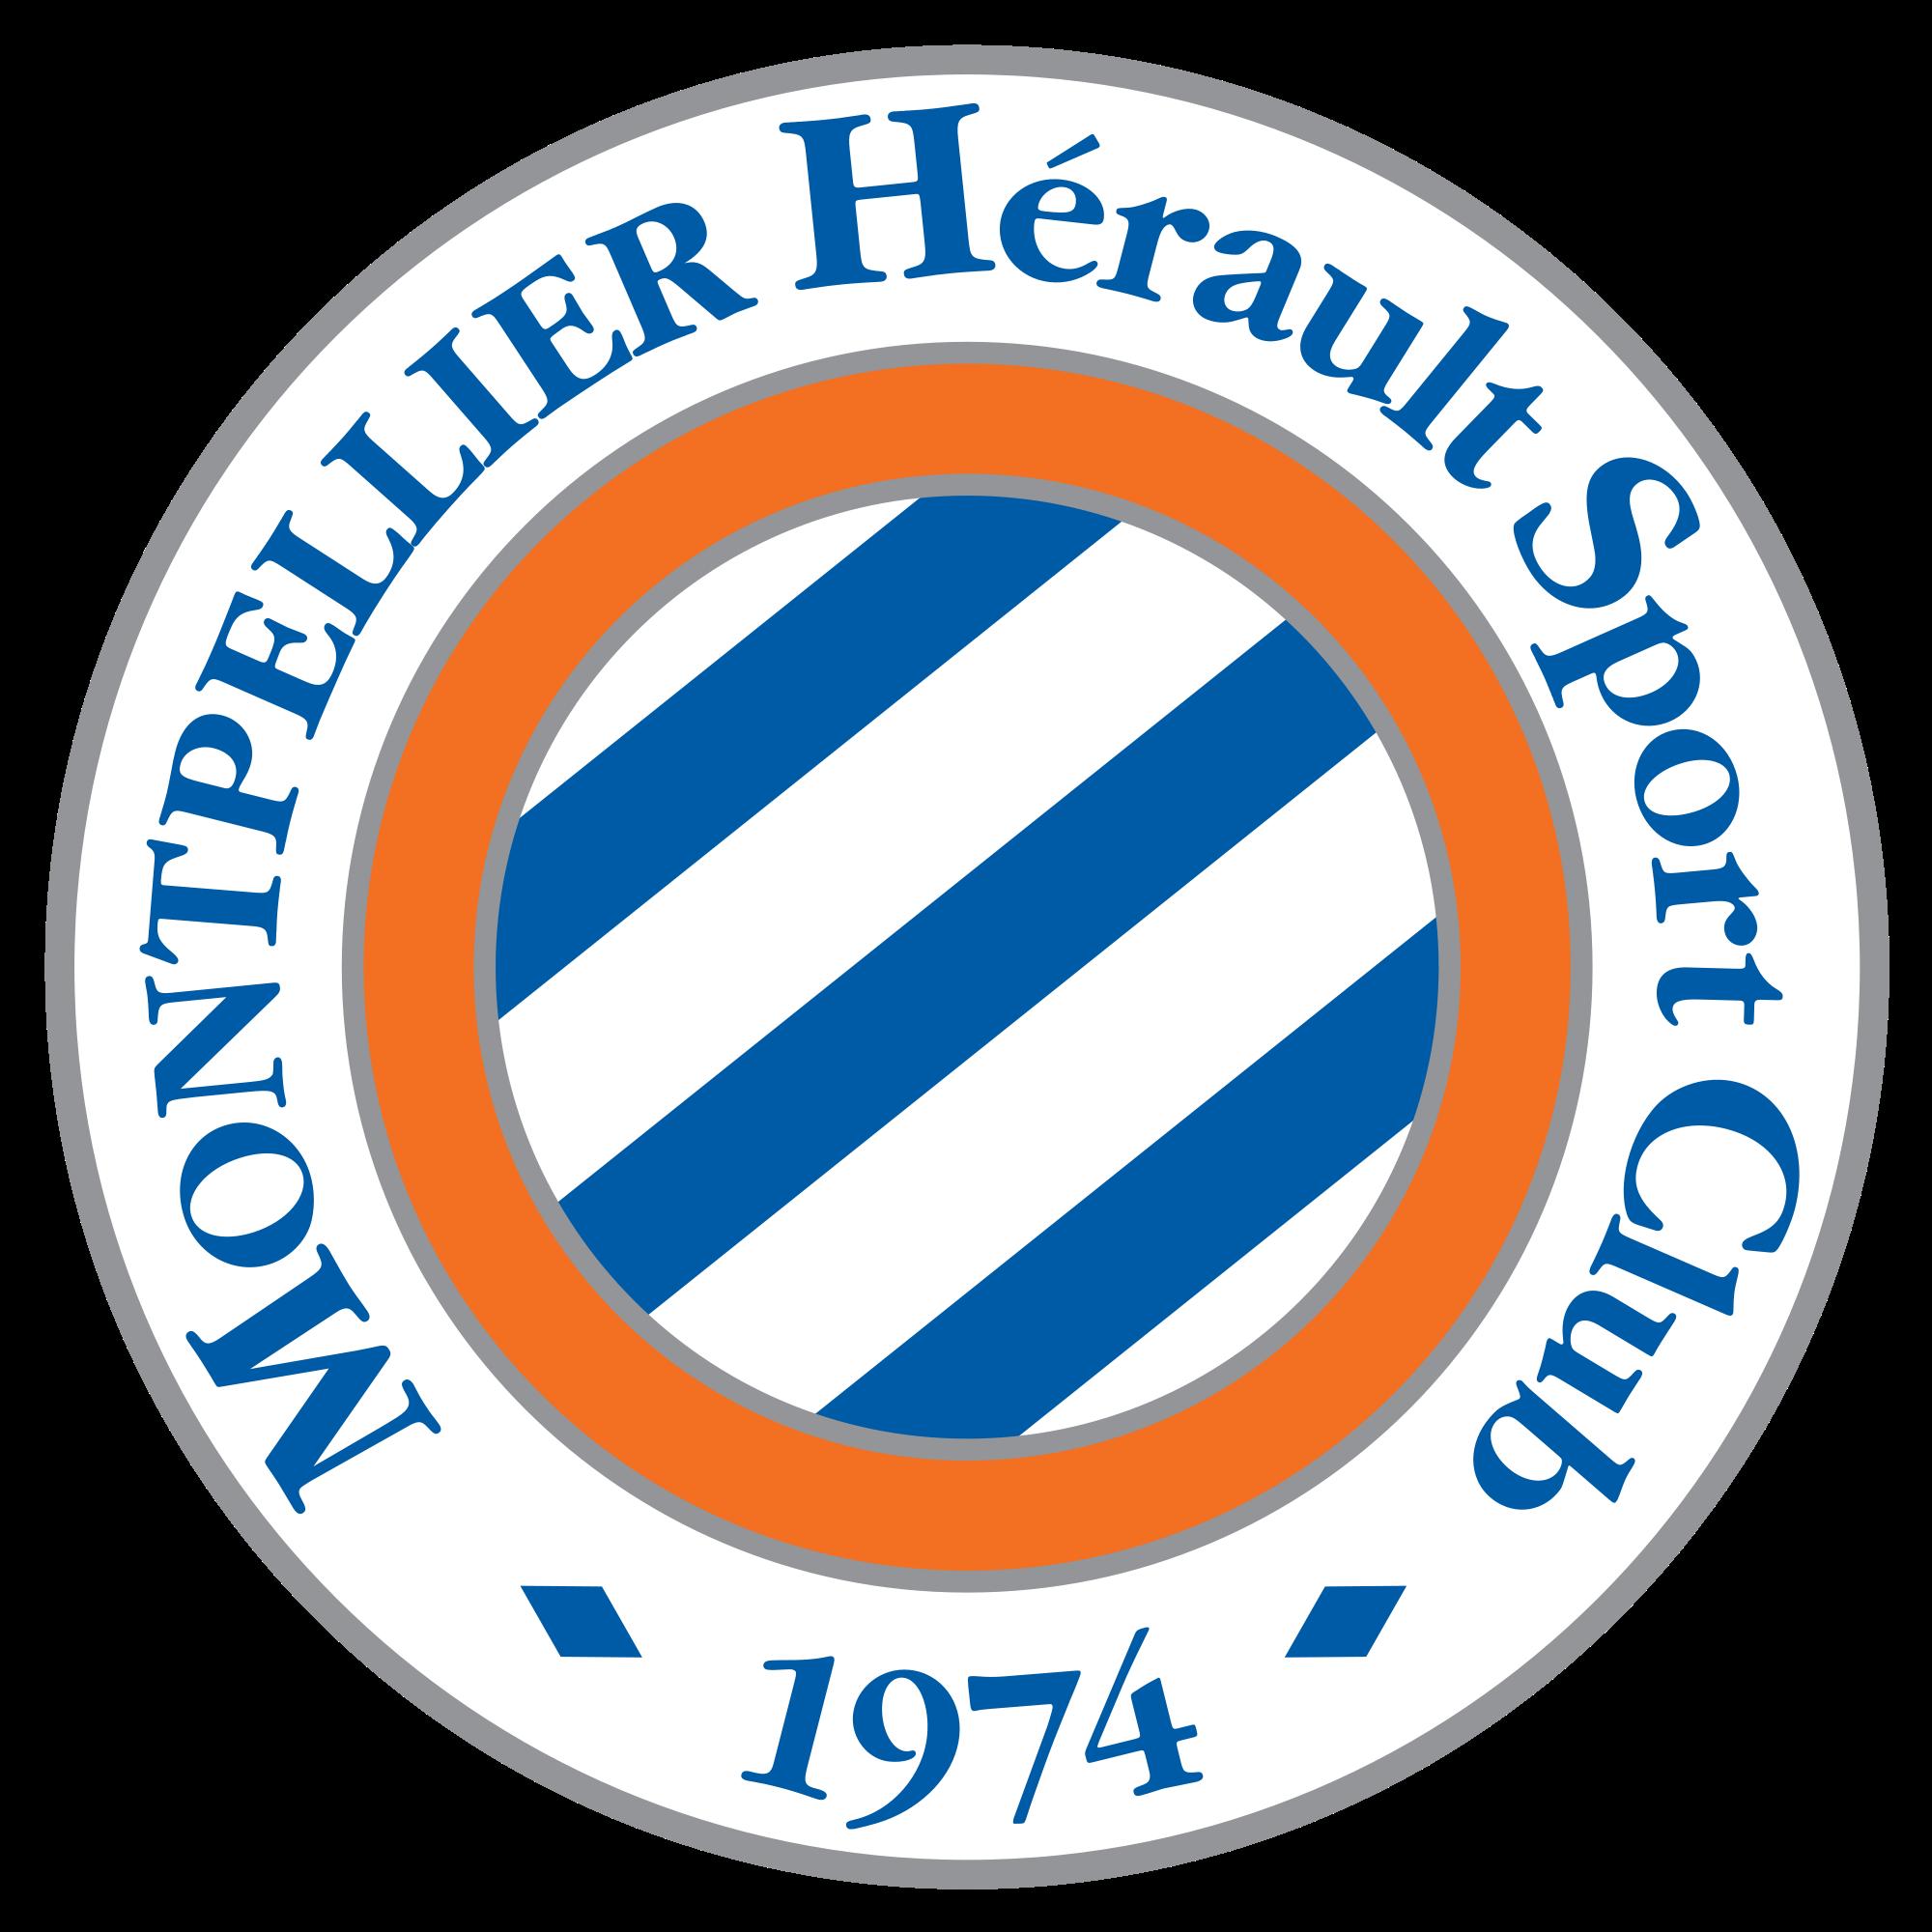 Montpellier Hsc Montpellier France Montpellier Football Team Logos Soccer Logo